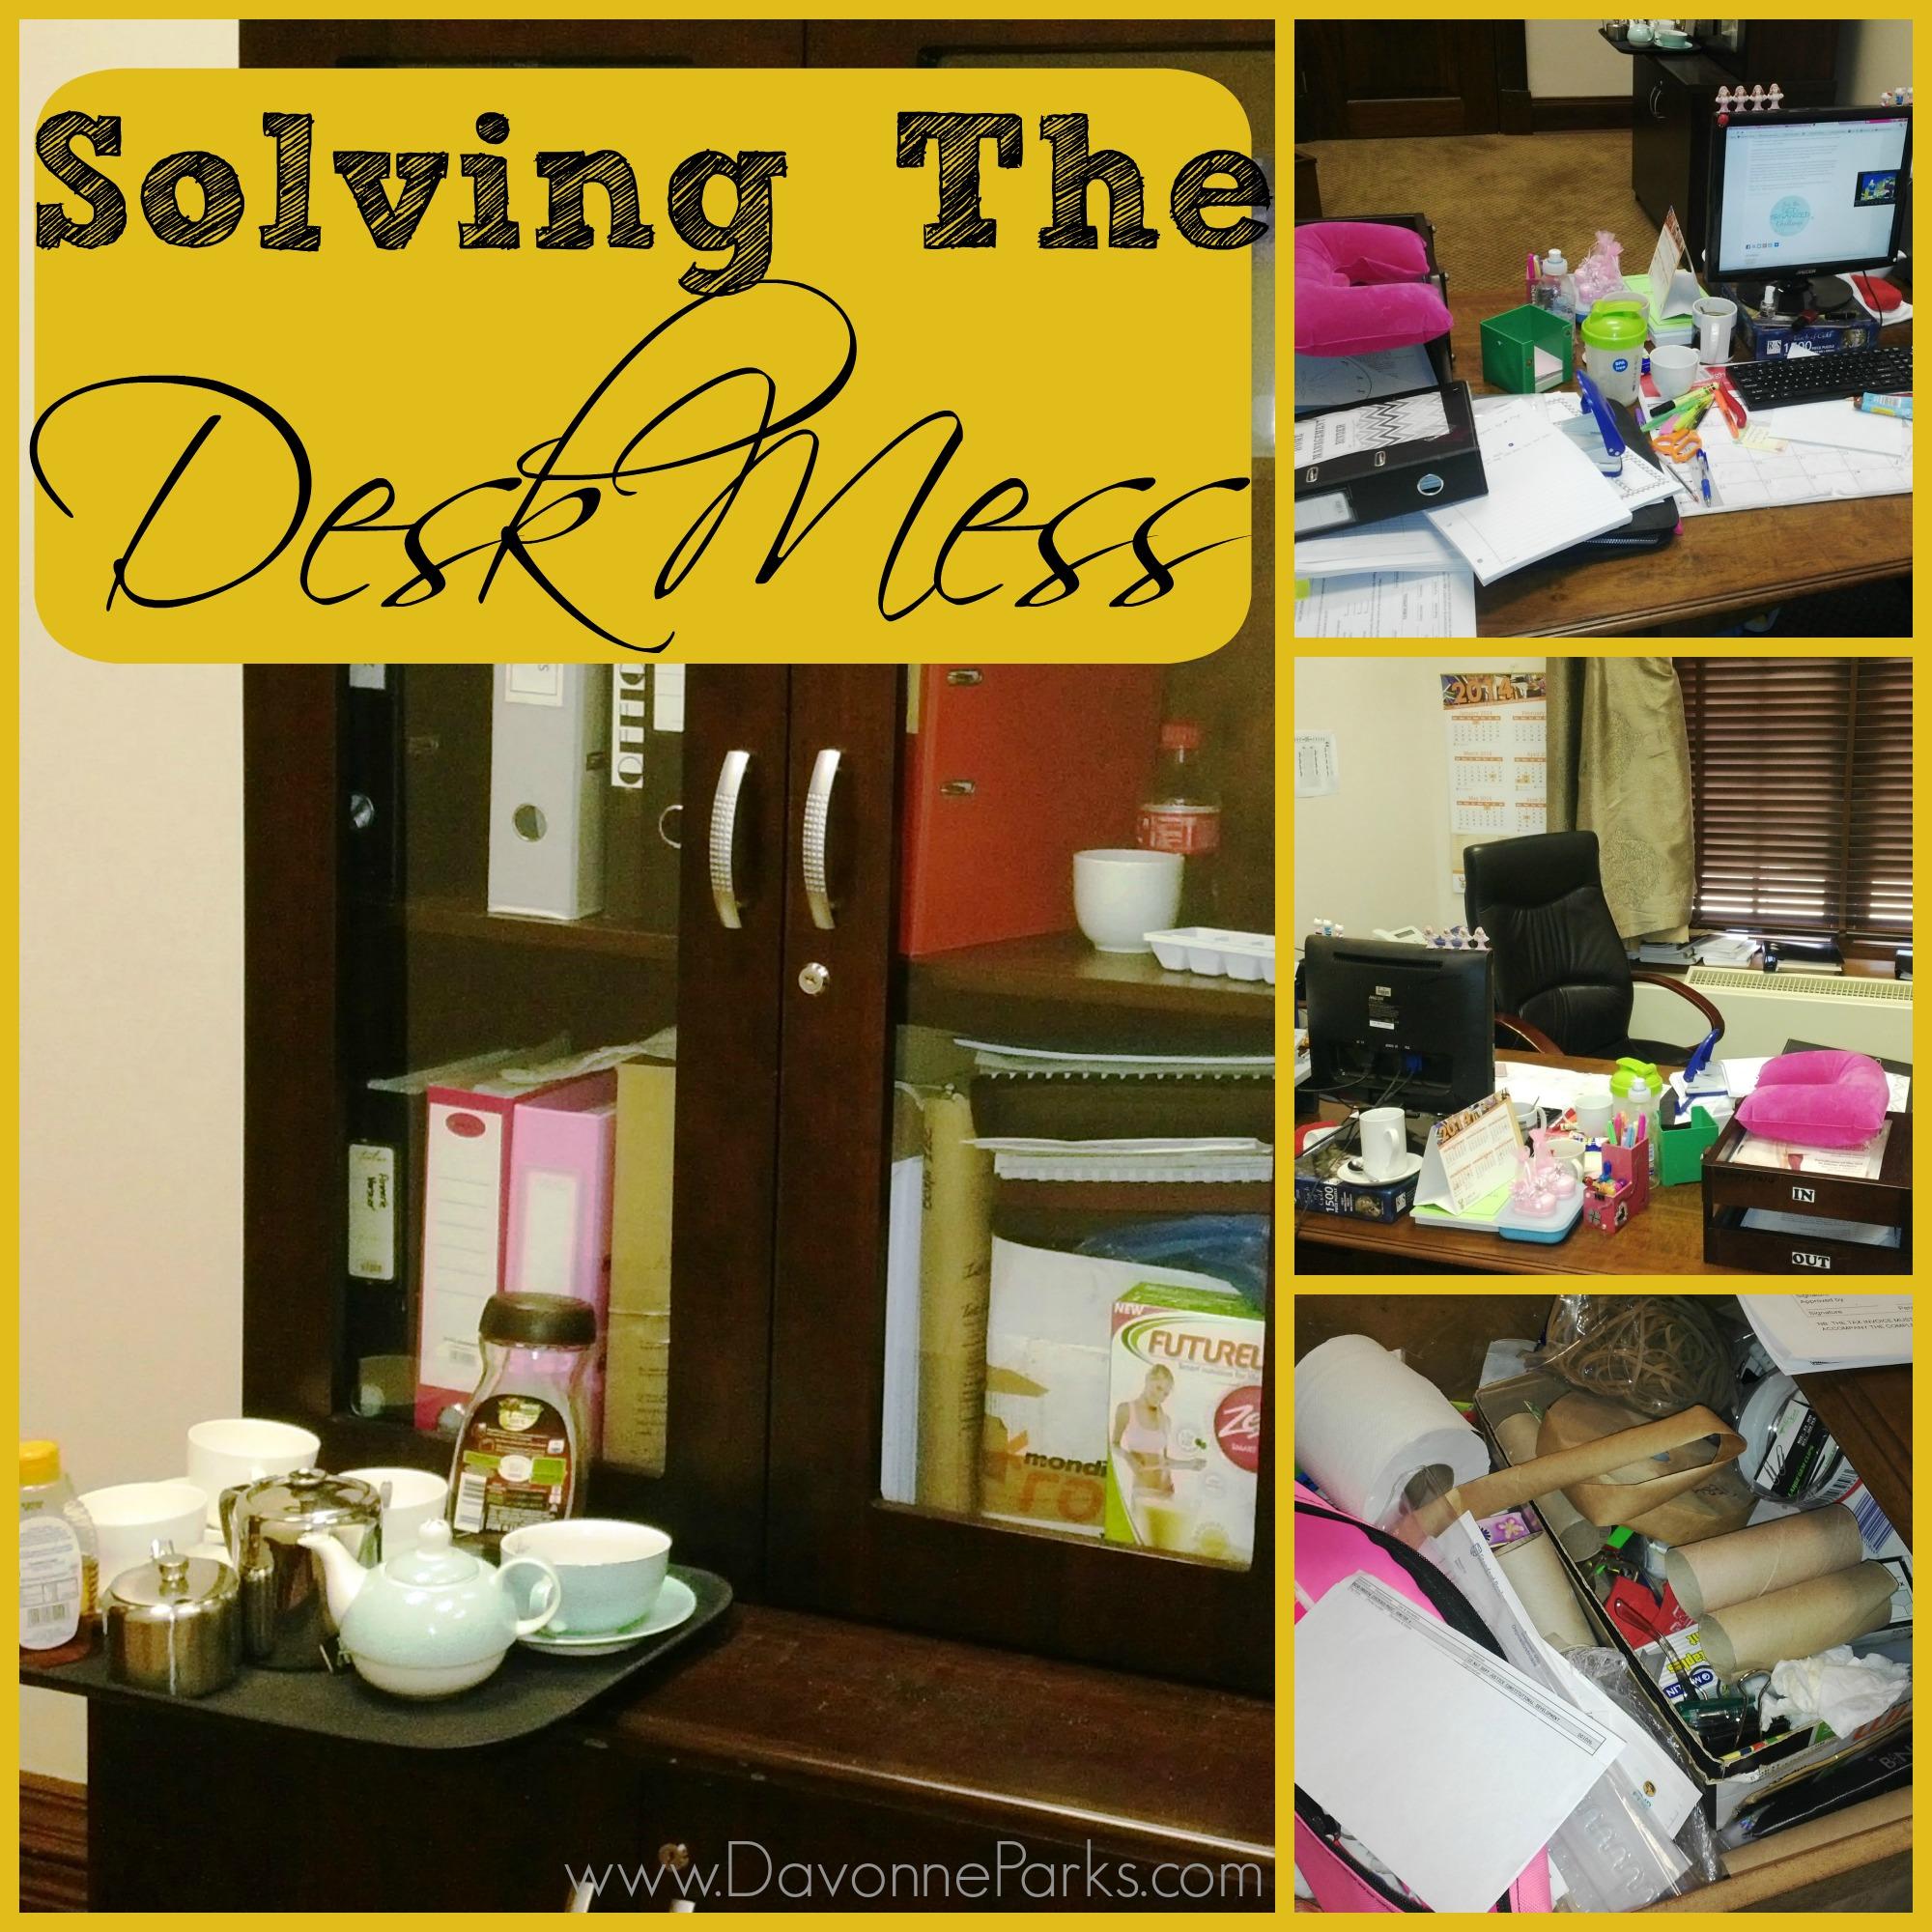 Solving the Desk Mess